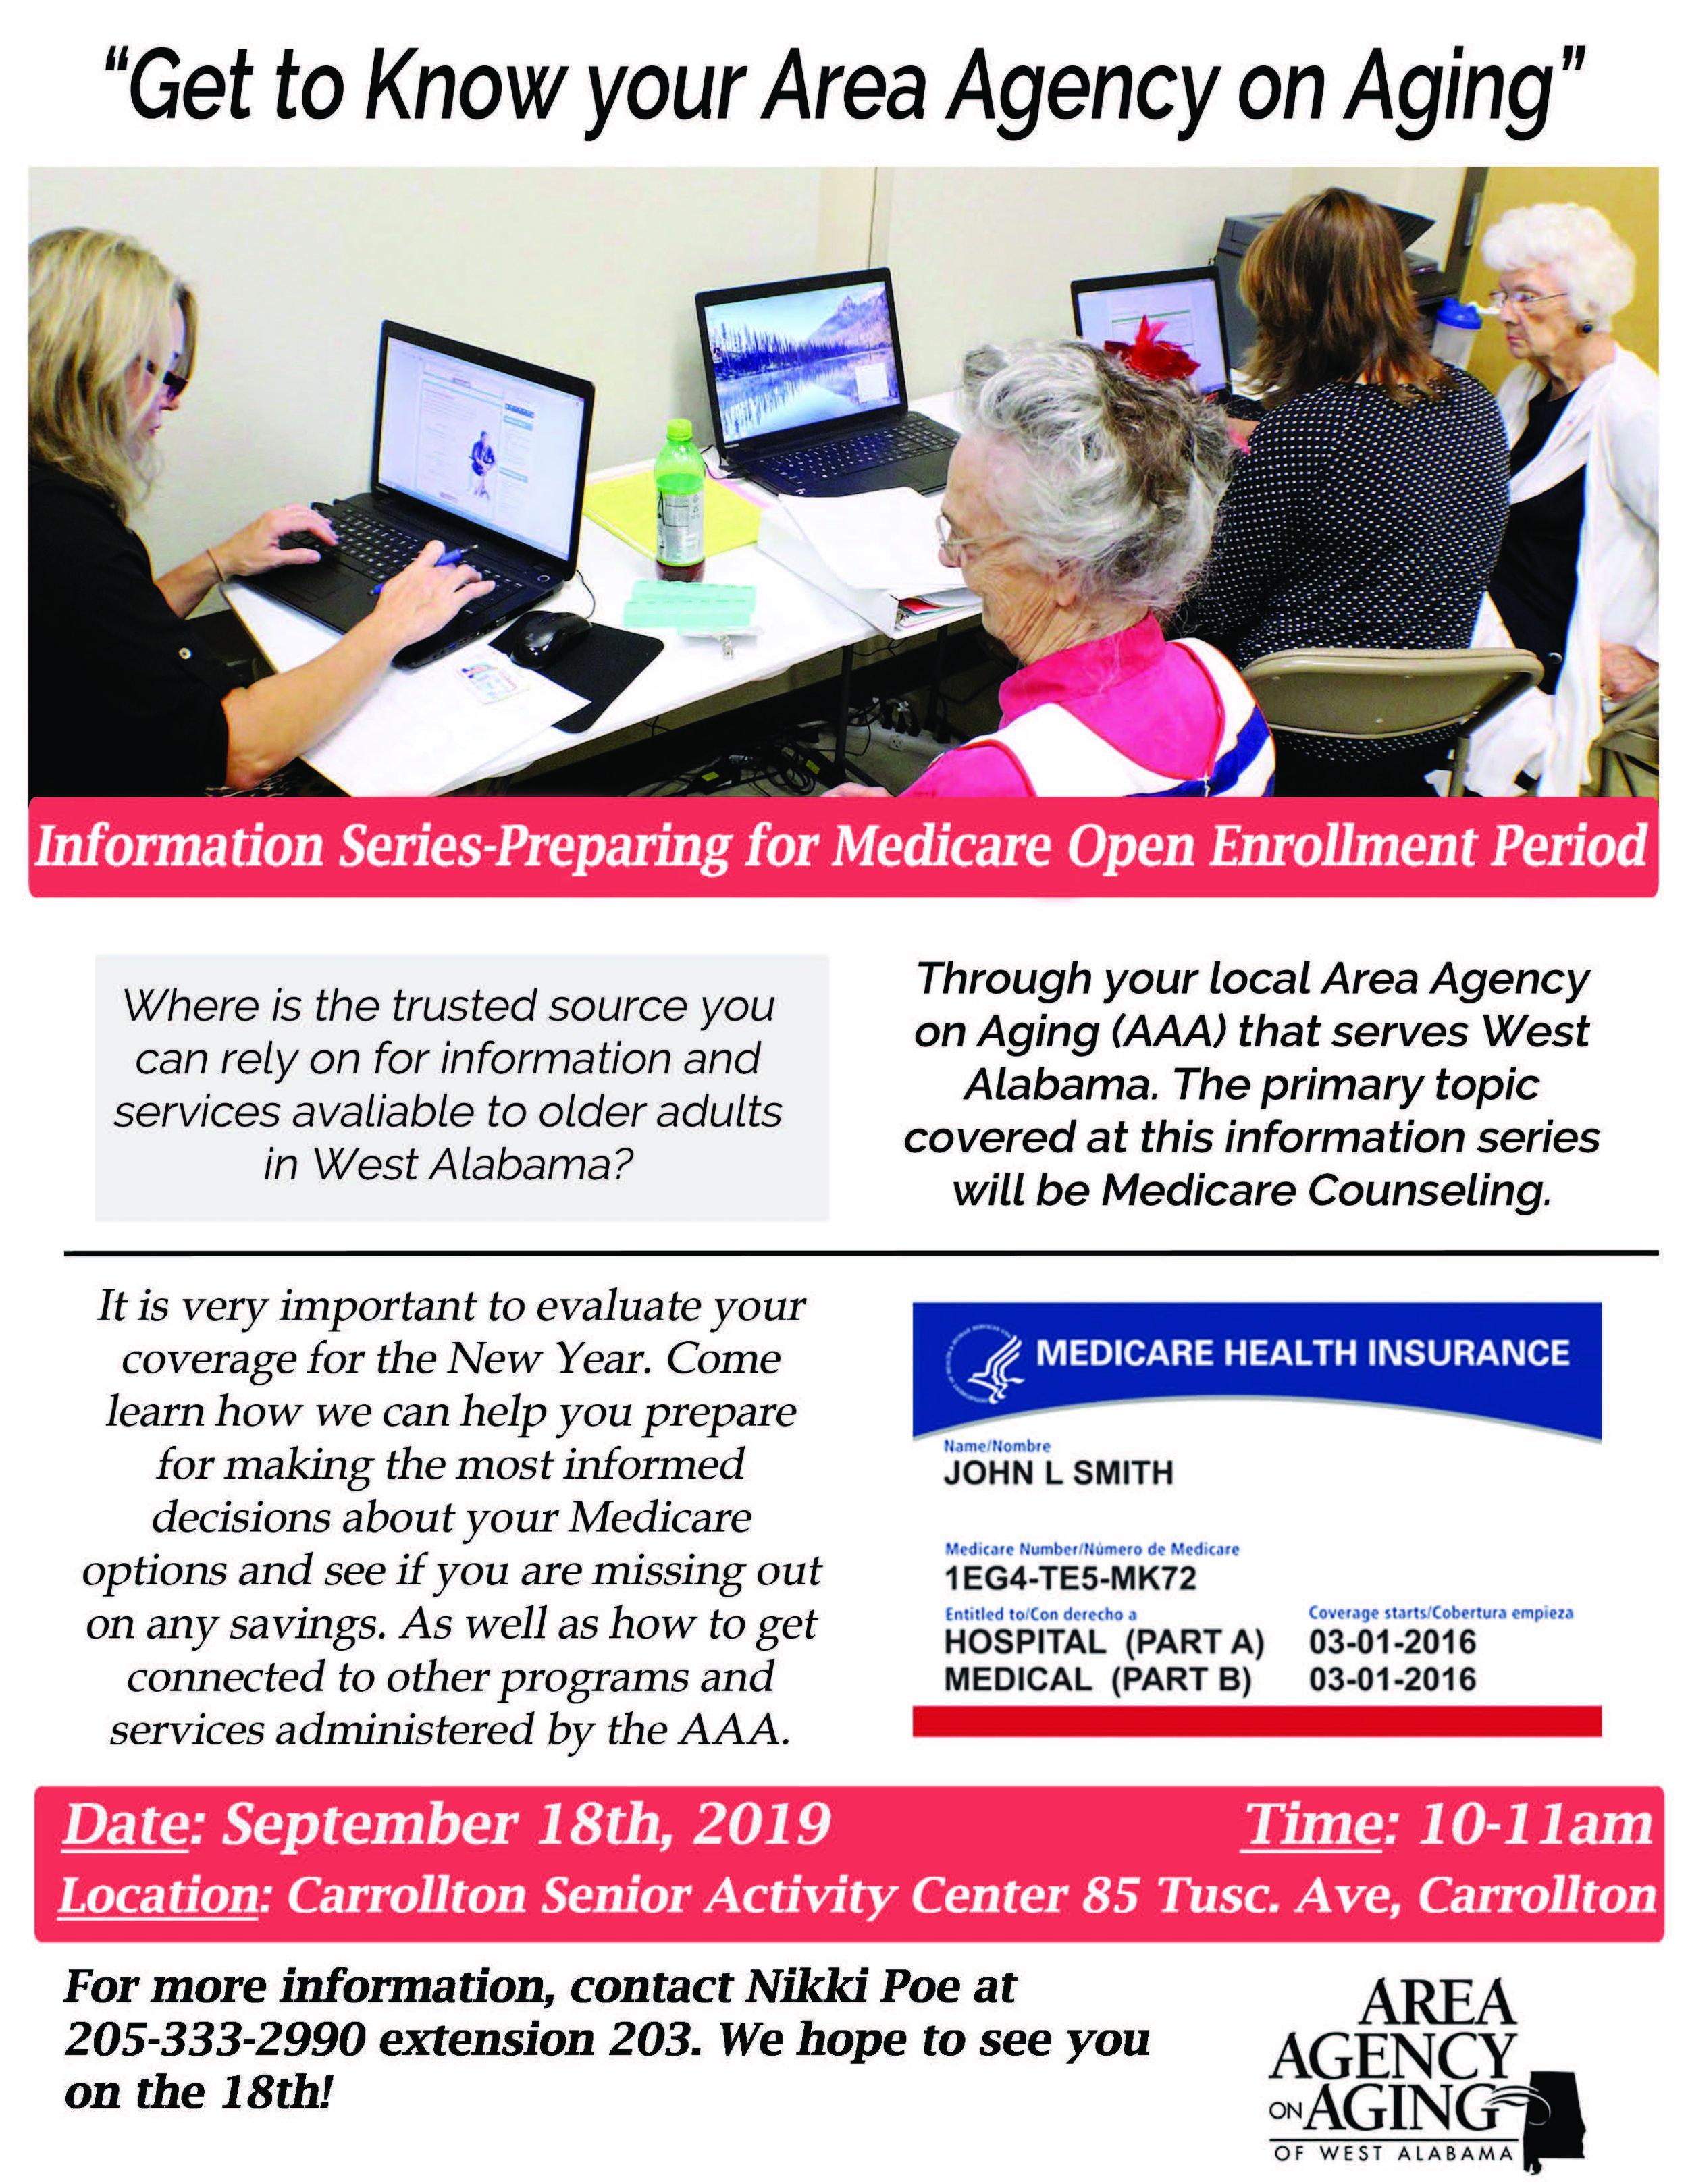 Medicare Counseling Flyer 2019 - Carrollton.jpg